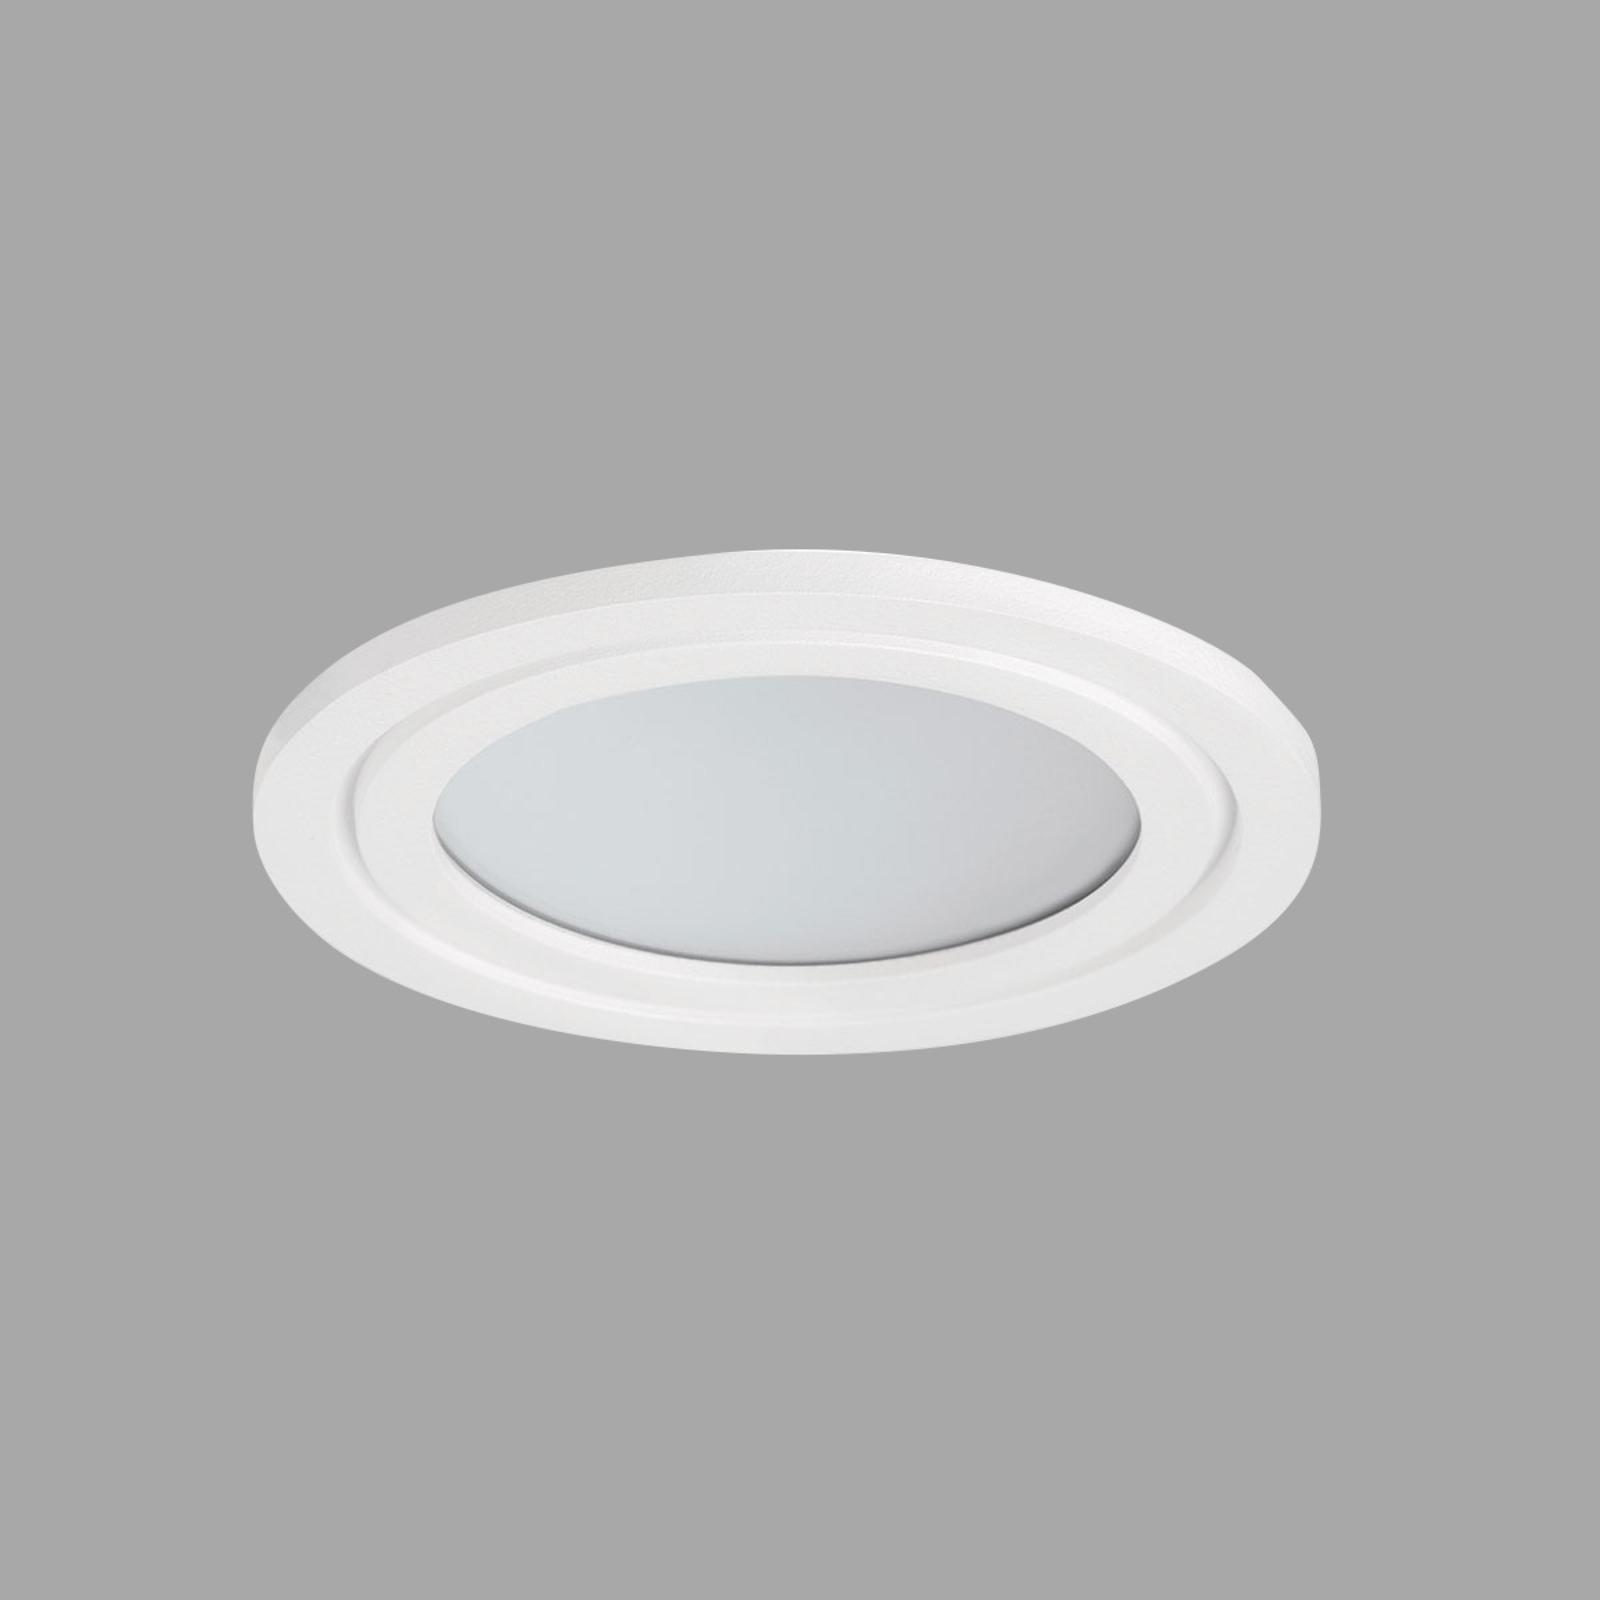 Prettus XS PRO LED-Einbauspot m. Abdeckung, 3.000K